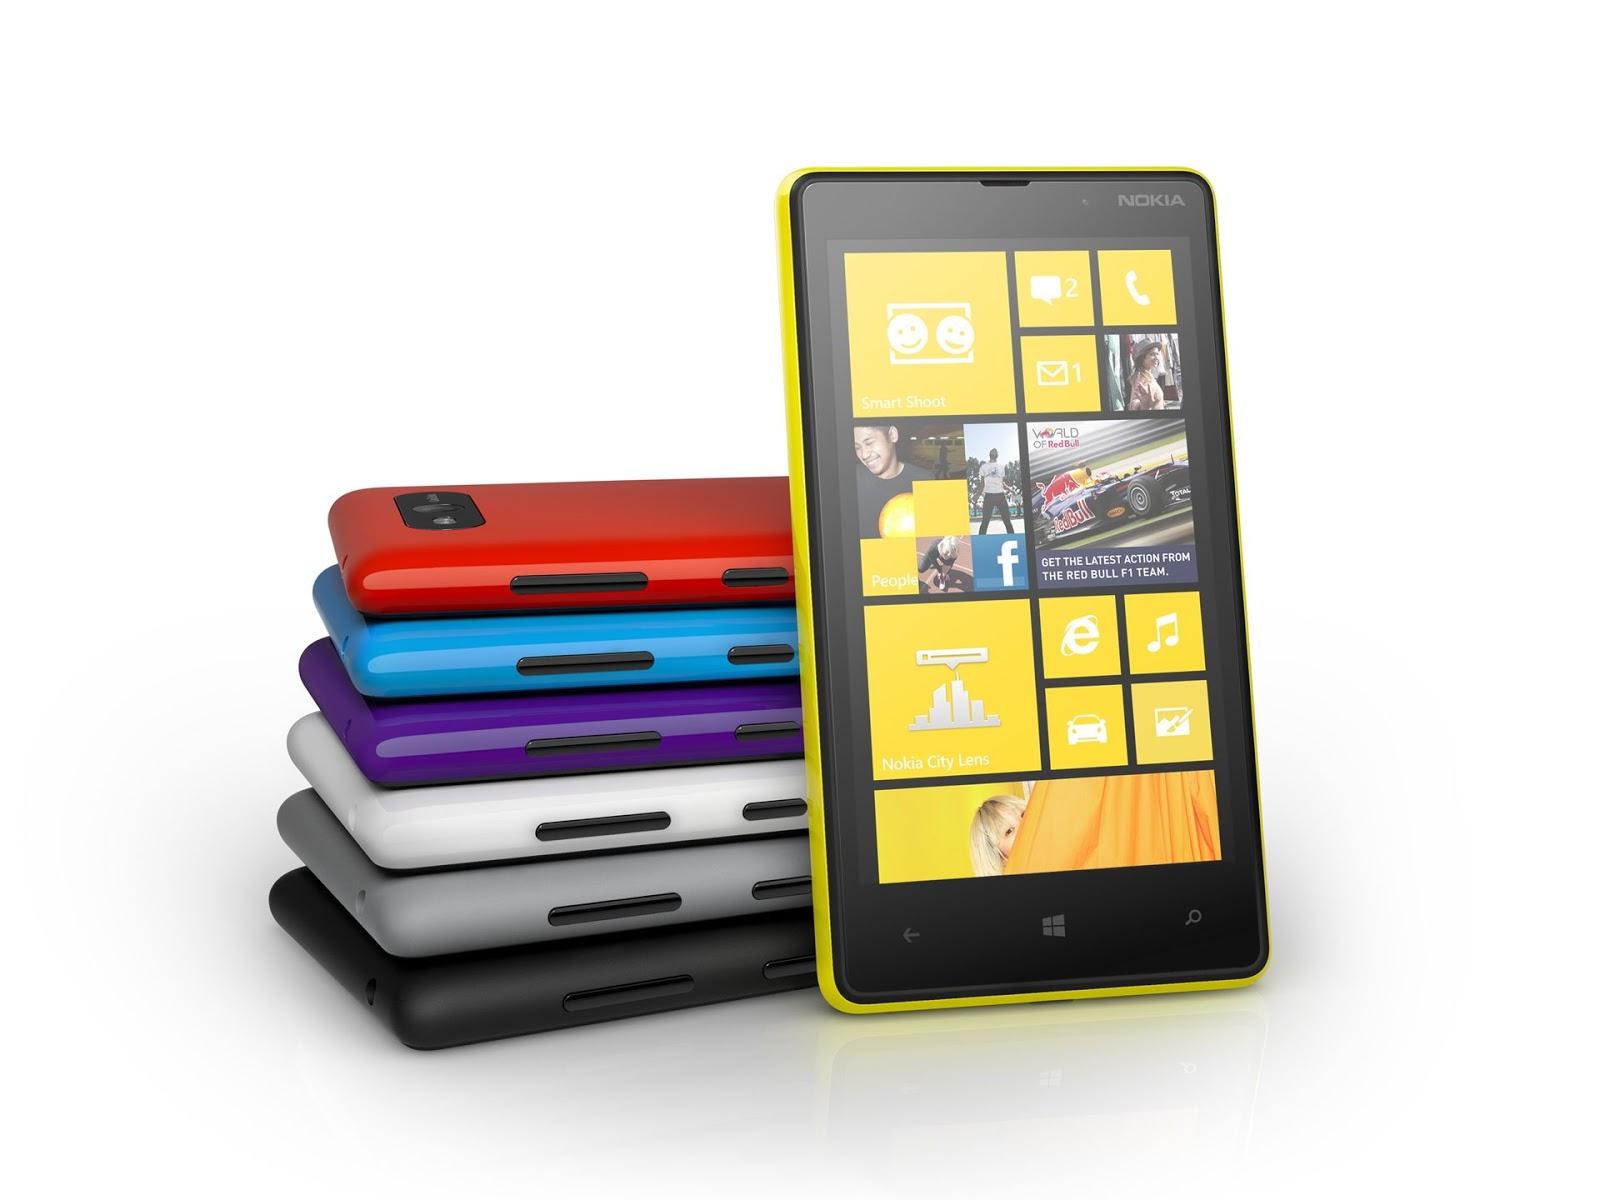 http://2.bp.blogspot.com/-kaNR6dbmrPk/UUQVP0FrC6I/AAAAAAAAI-k/0pk37lVFu9A/s1600/Nokia-Lumia-820-Nokia-Lumia-920-Windows-Phone.jpg